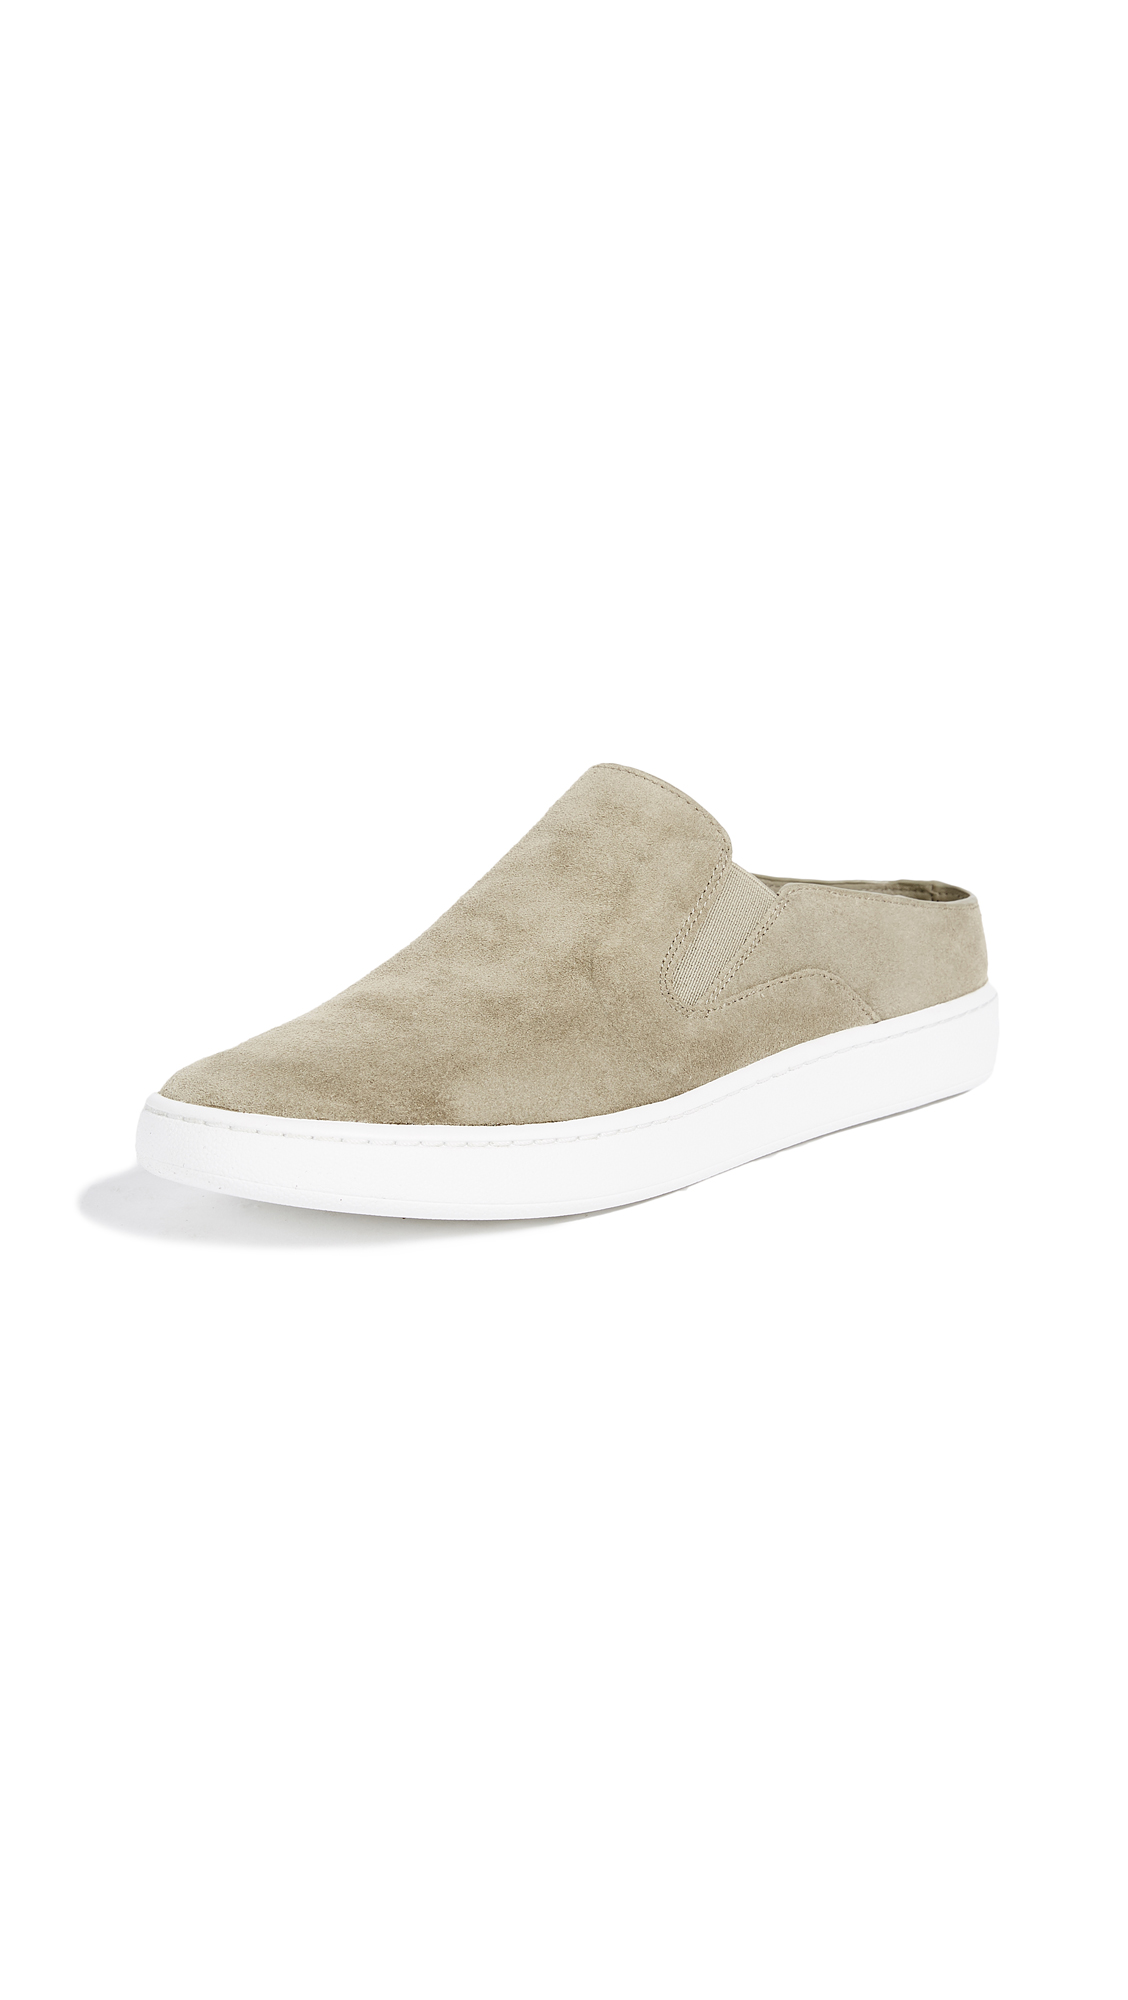 Vince Verrell 2 Slide Sneakers - Silversage